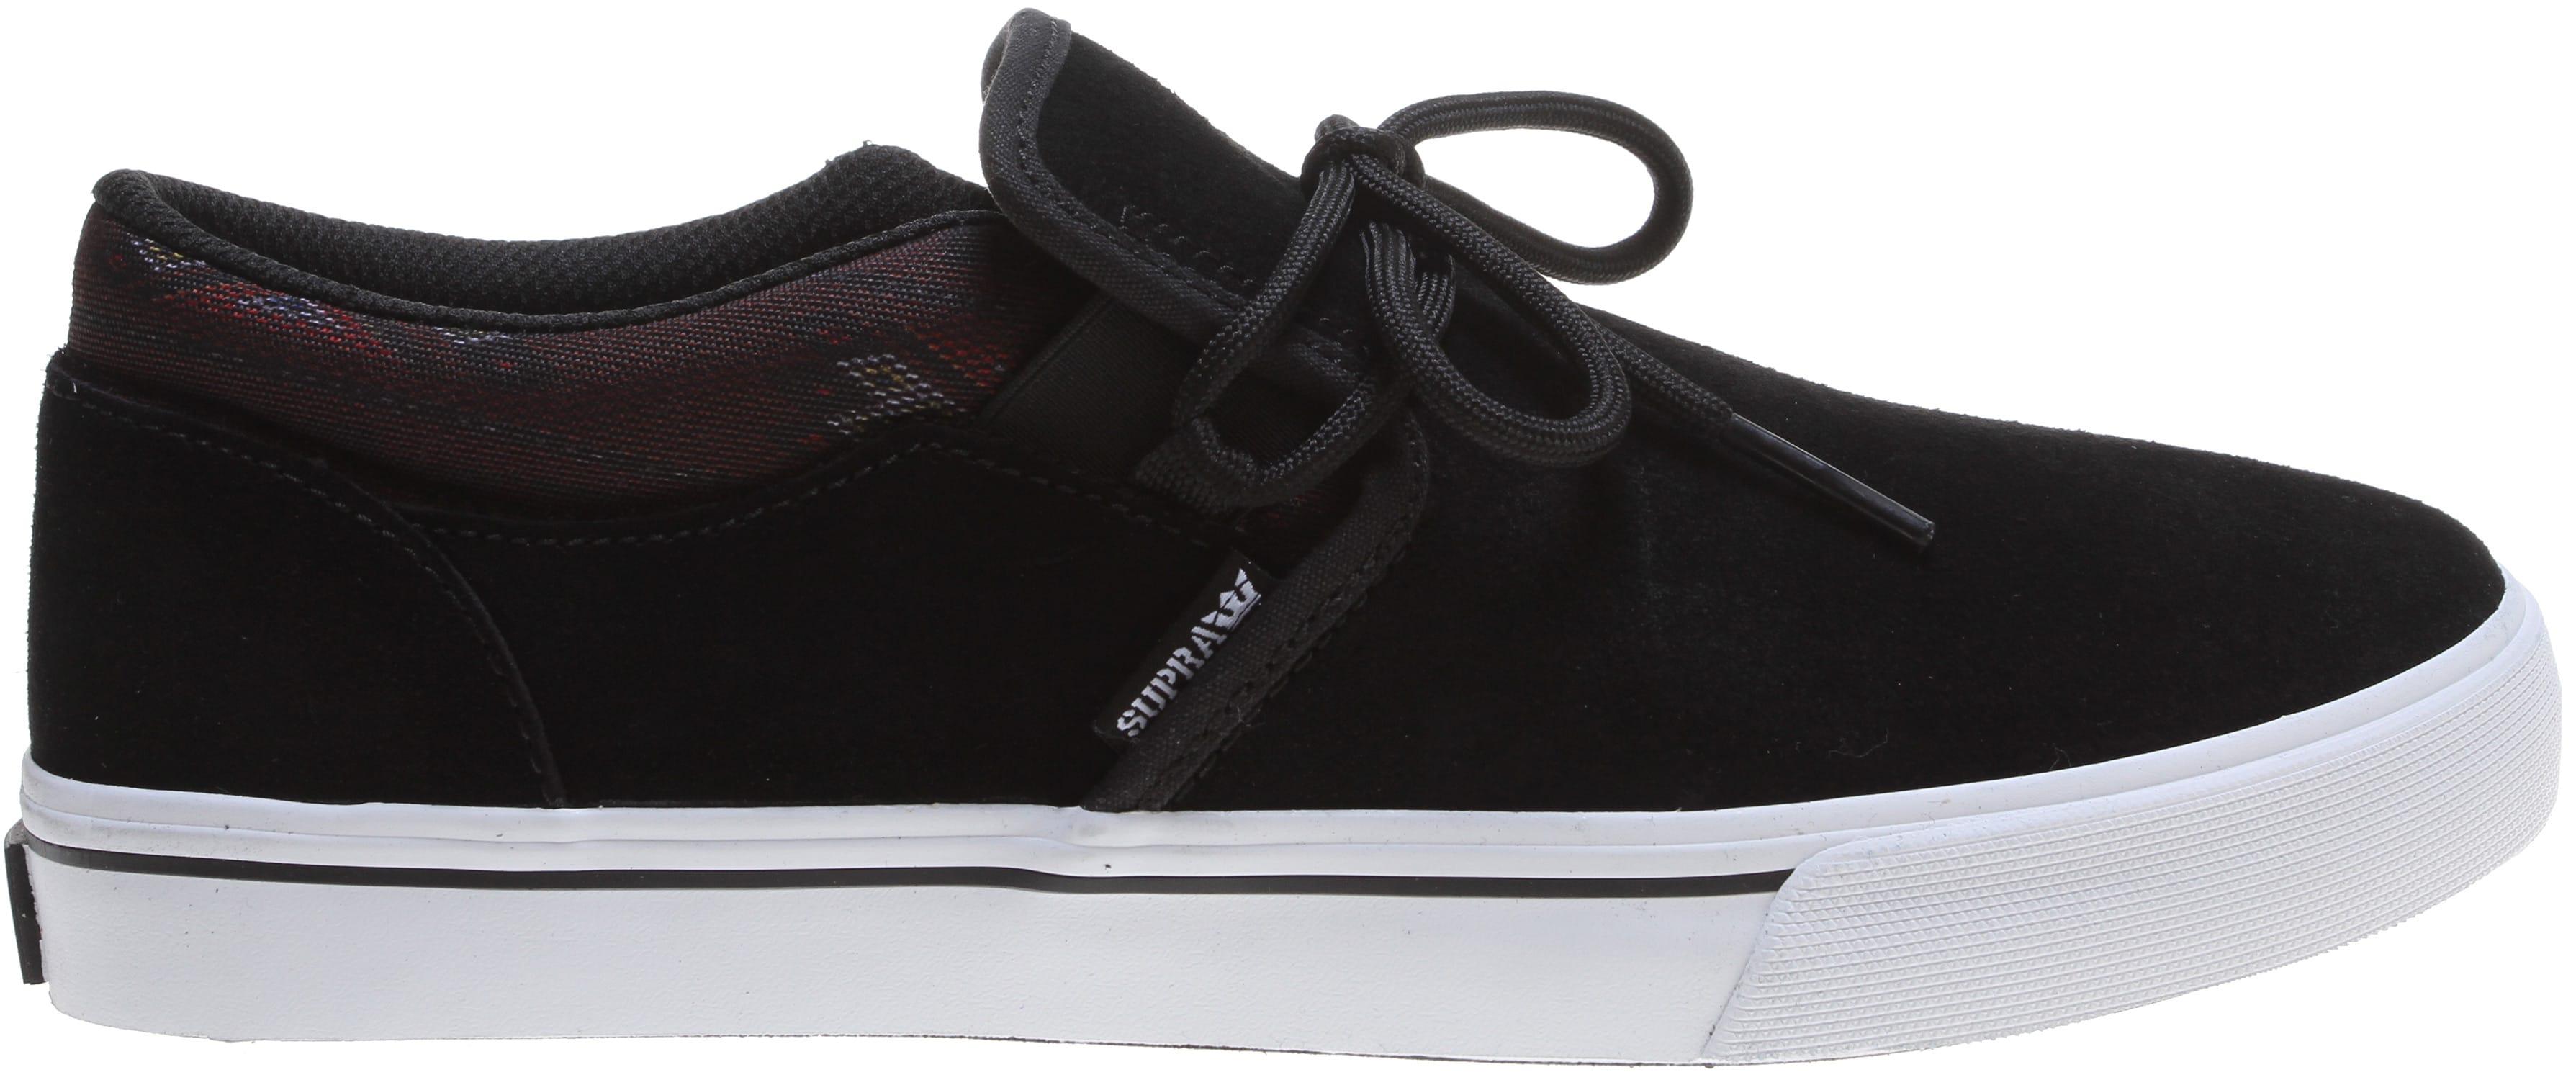 Supra Mens Cuba Black White Skate Shoes 7Gi4EL1zo